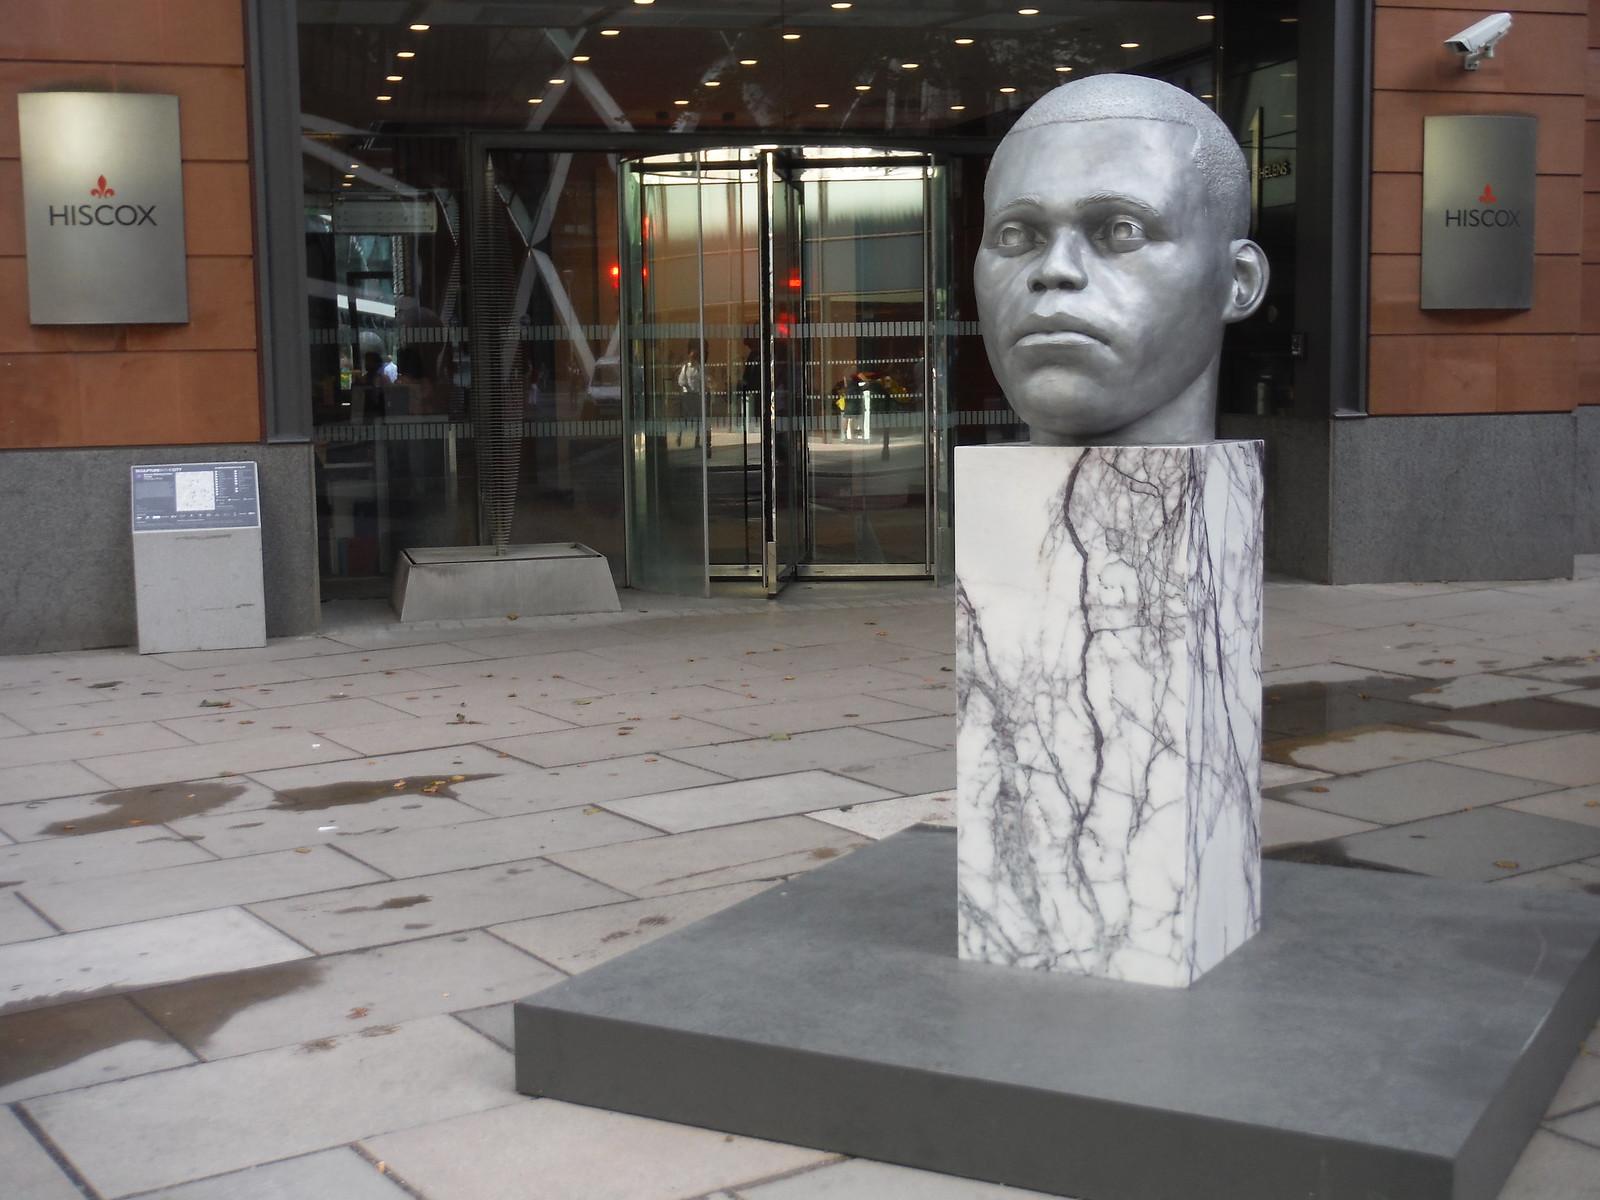 Thomas J Price - Numen (Shifting Votive Three) SWC Walk Short 24 - Sculpture in the City